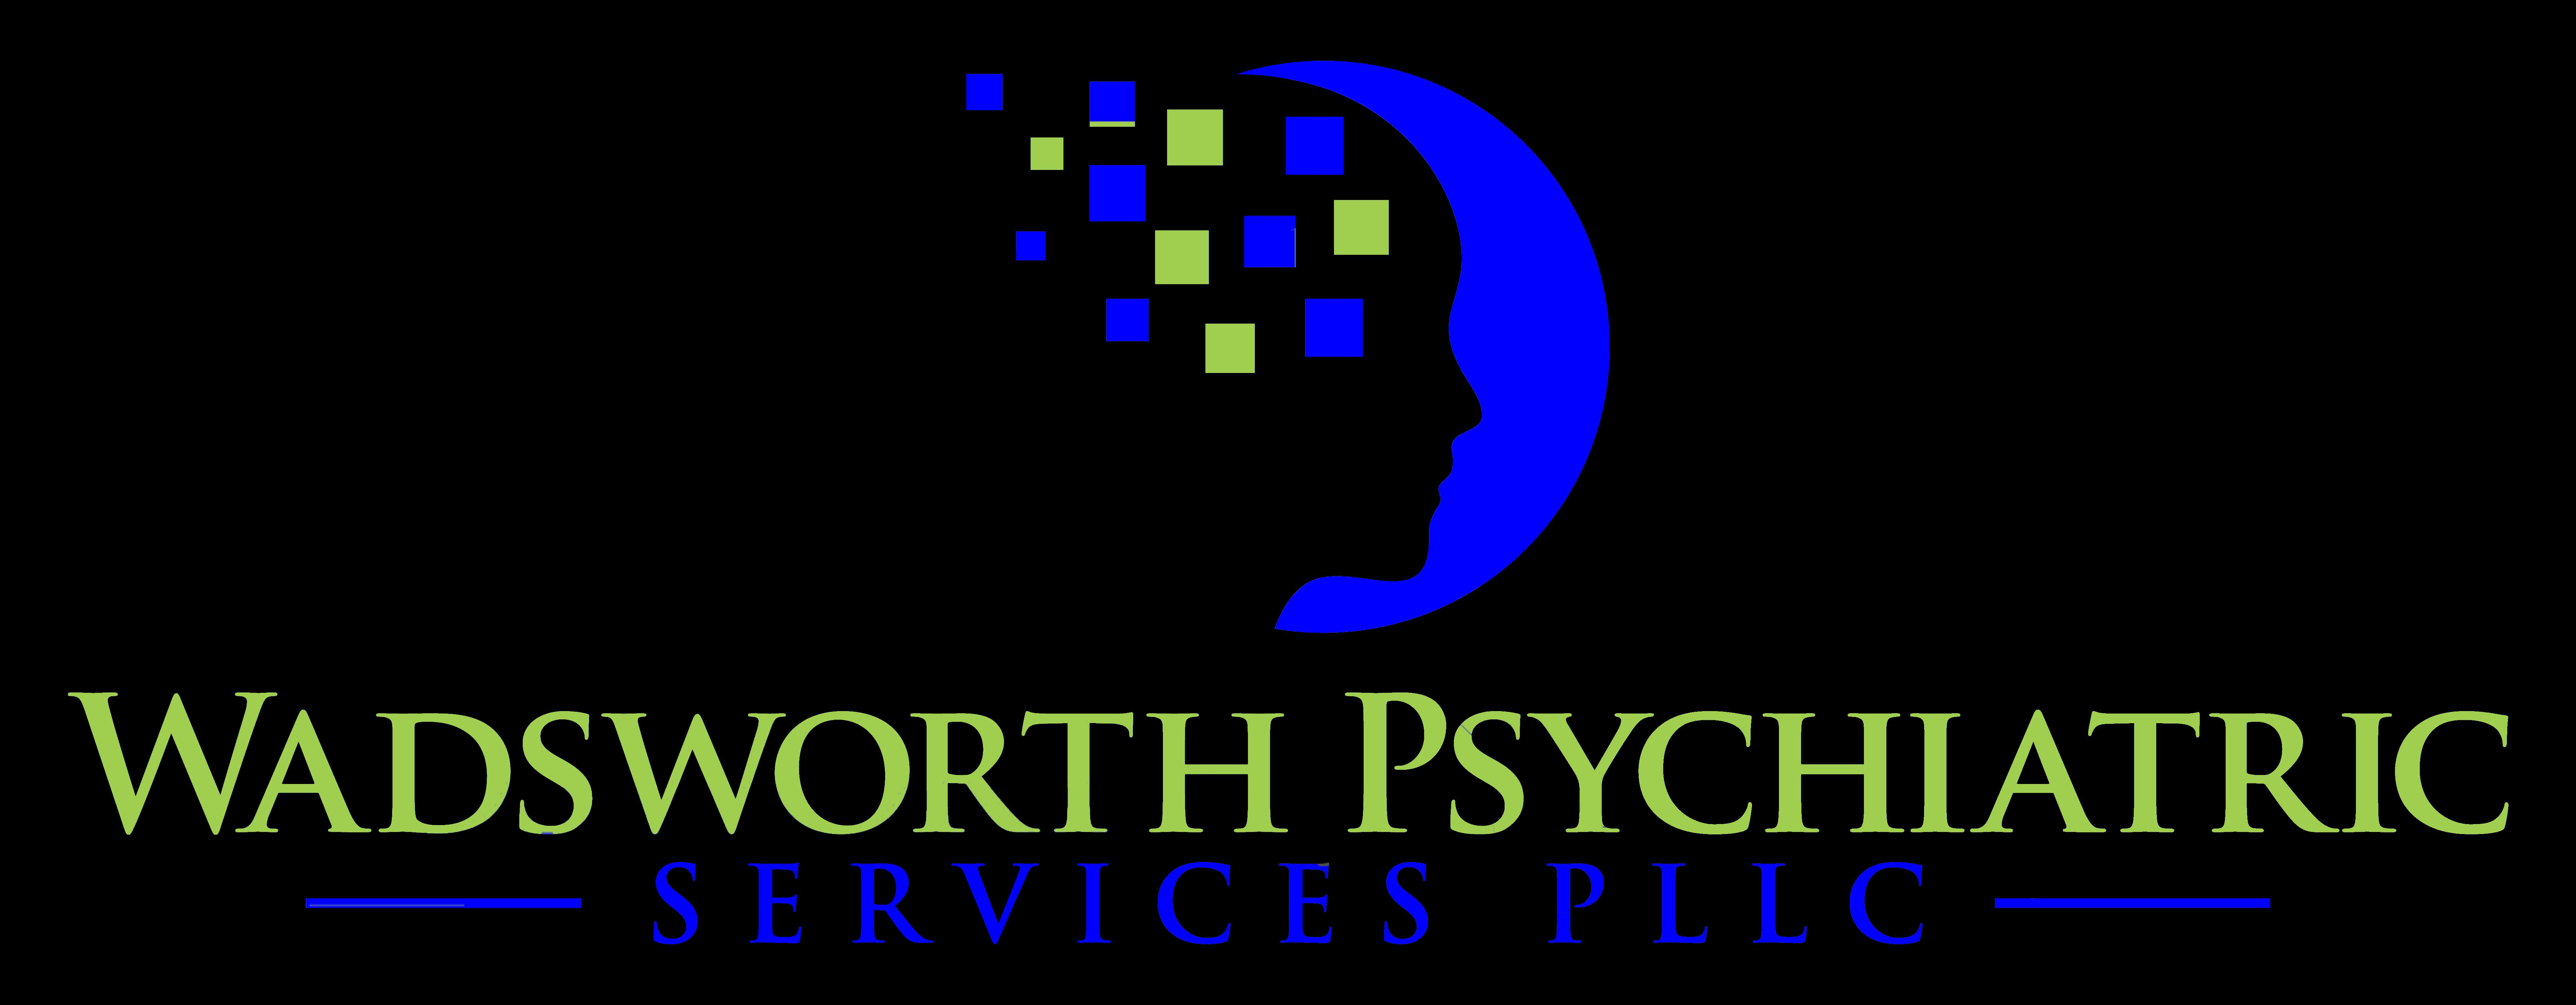 Wadsworth Psychiatric Services